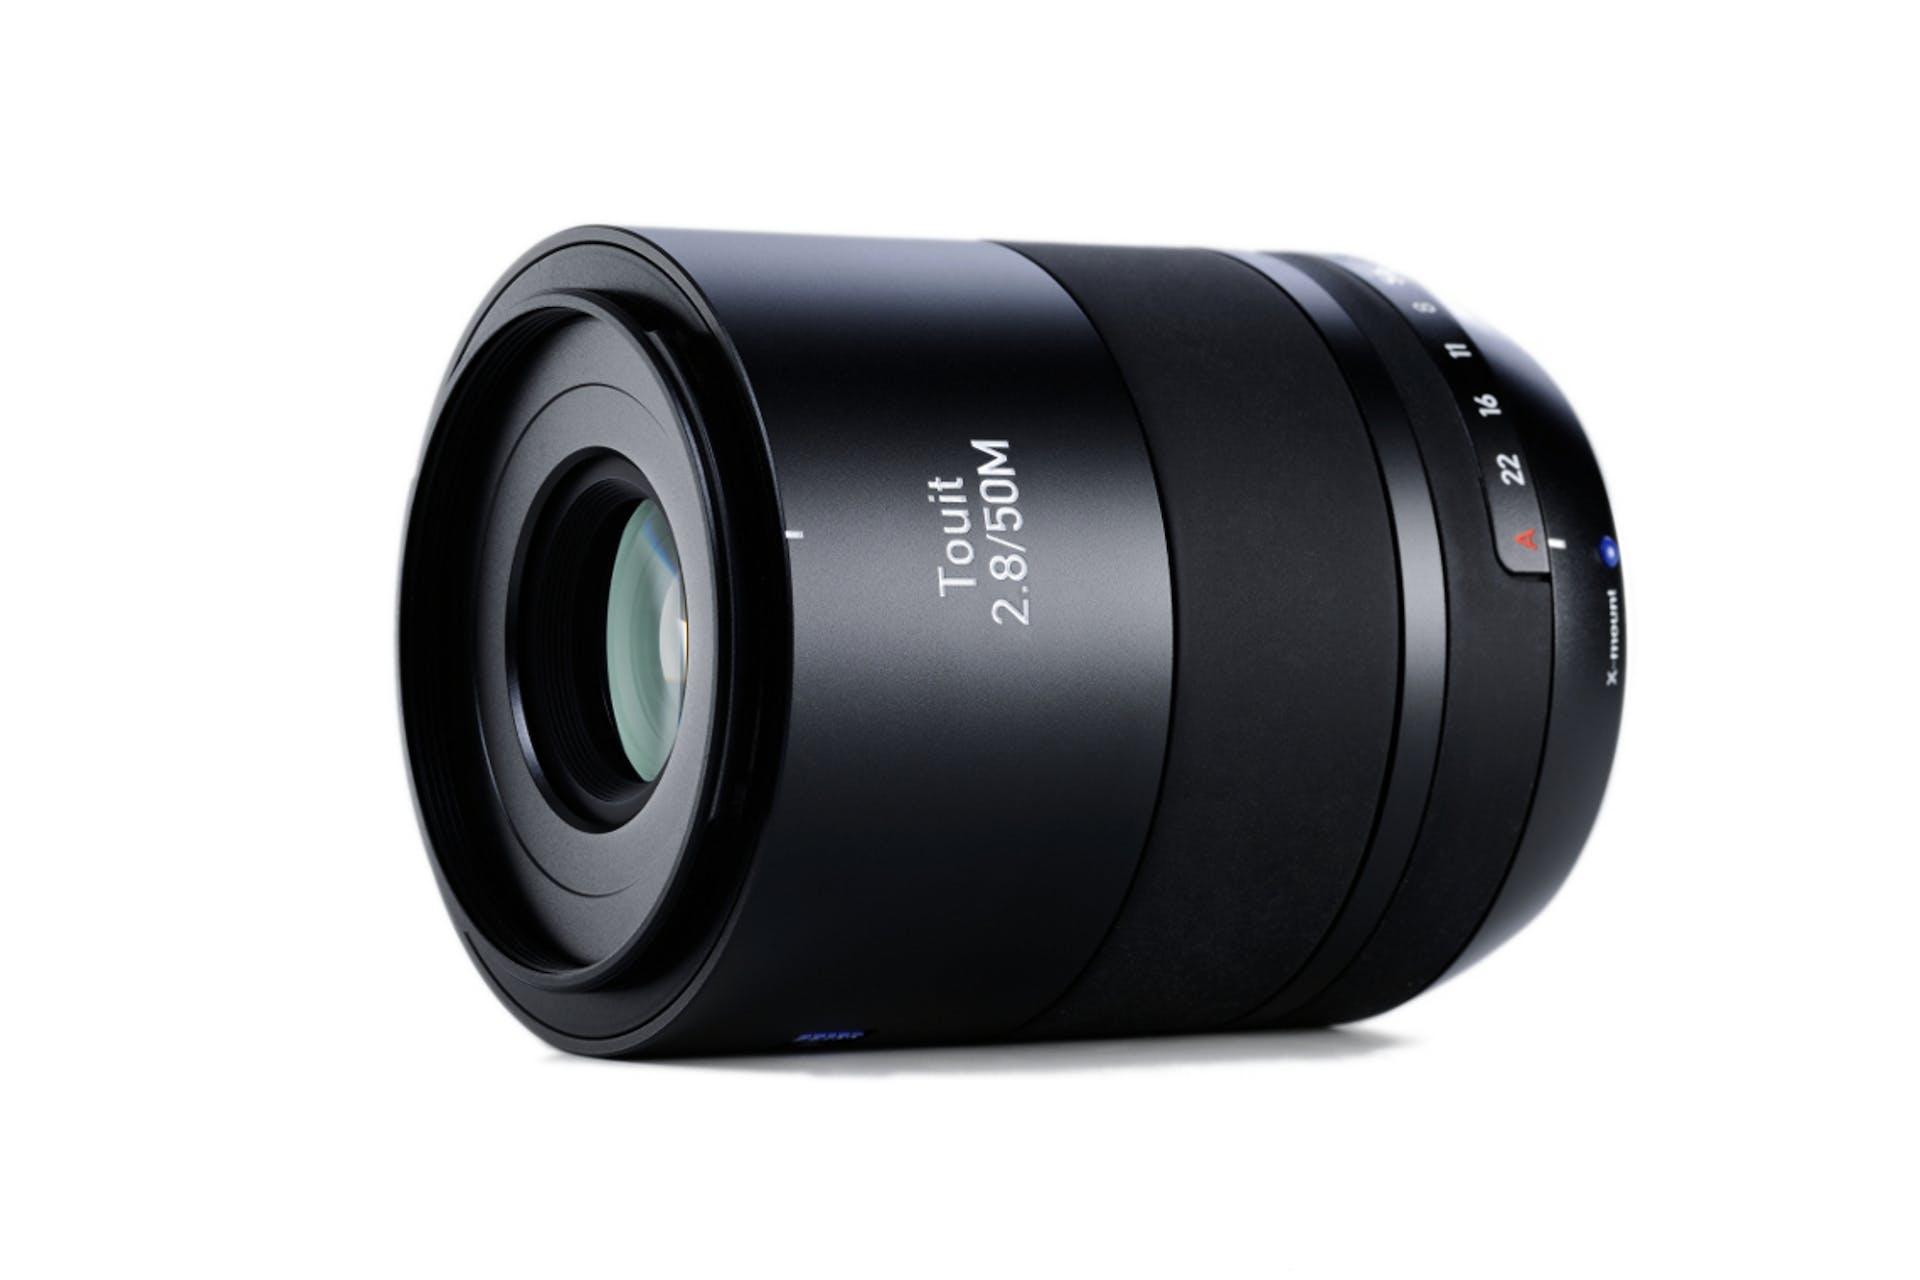 [Image: zeiss-touit-2850m-product-04.ts-15427121...8b9056b4f9]